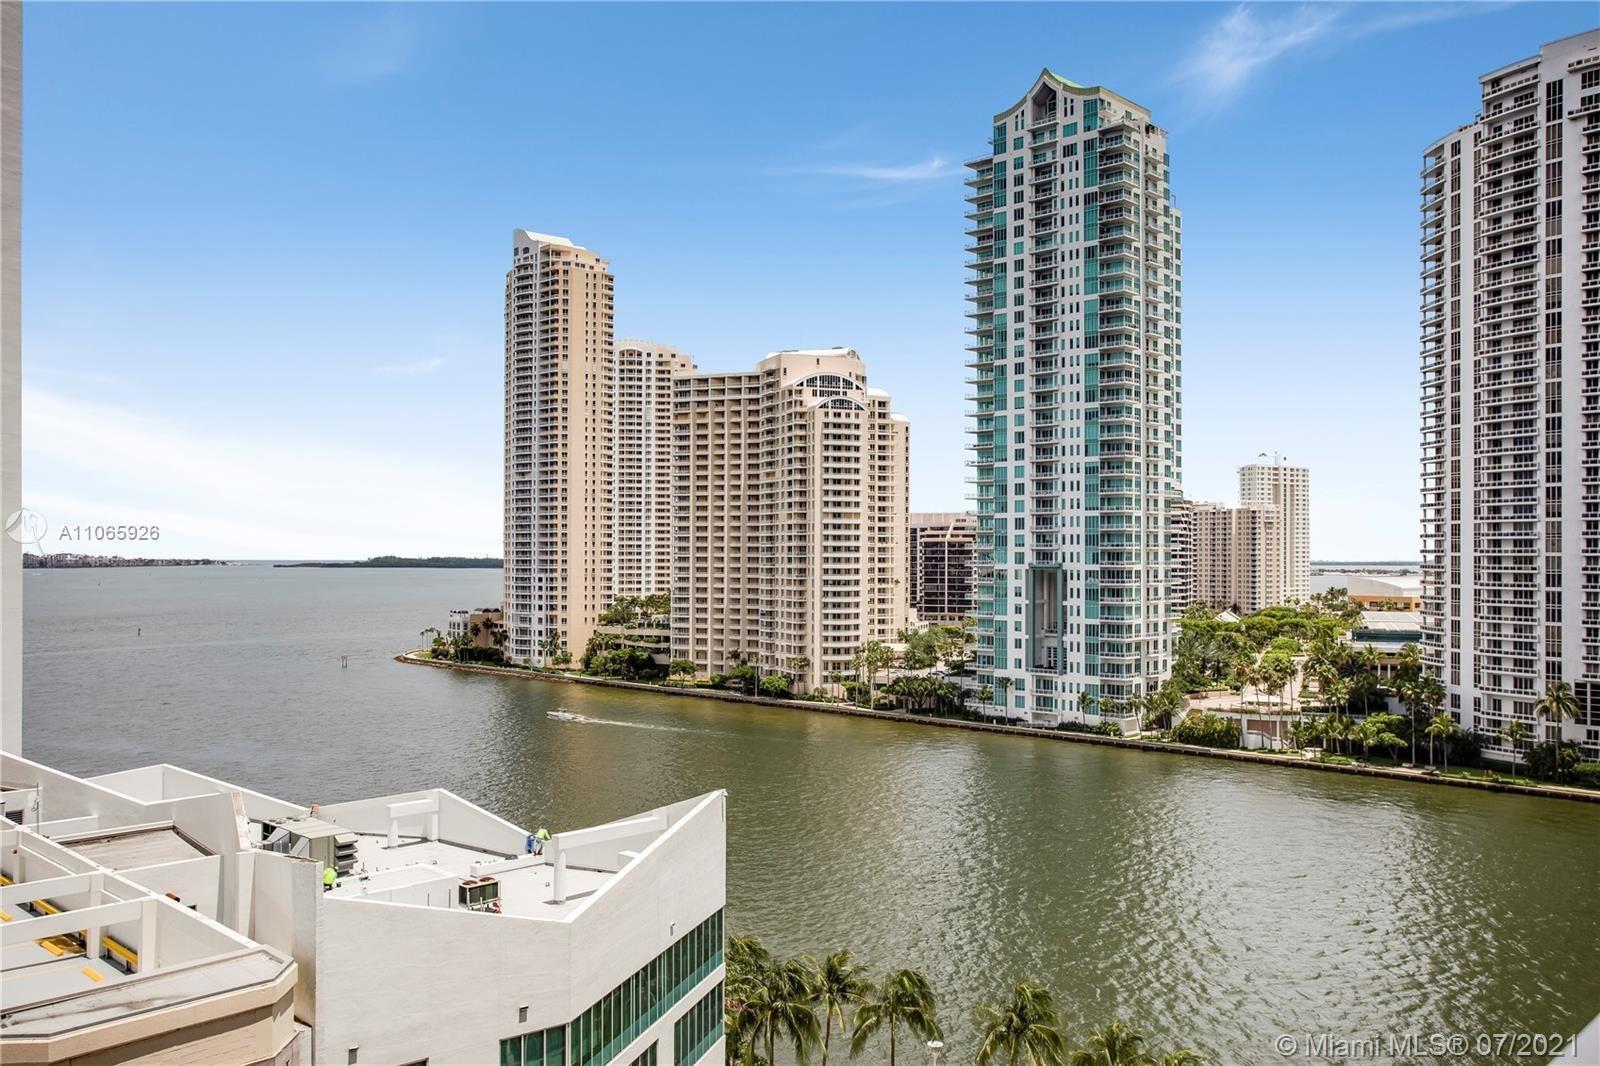 300 S Biscayne Blvd #L-1232, Miami, FL 33131 - #: A11065926